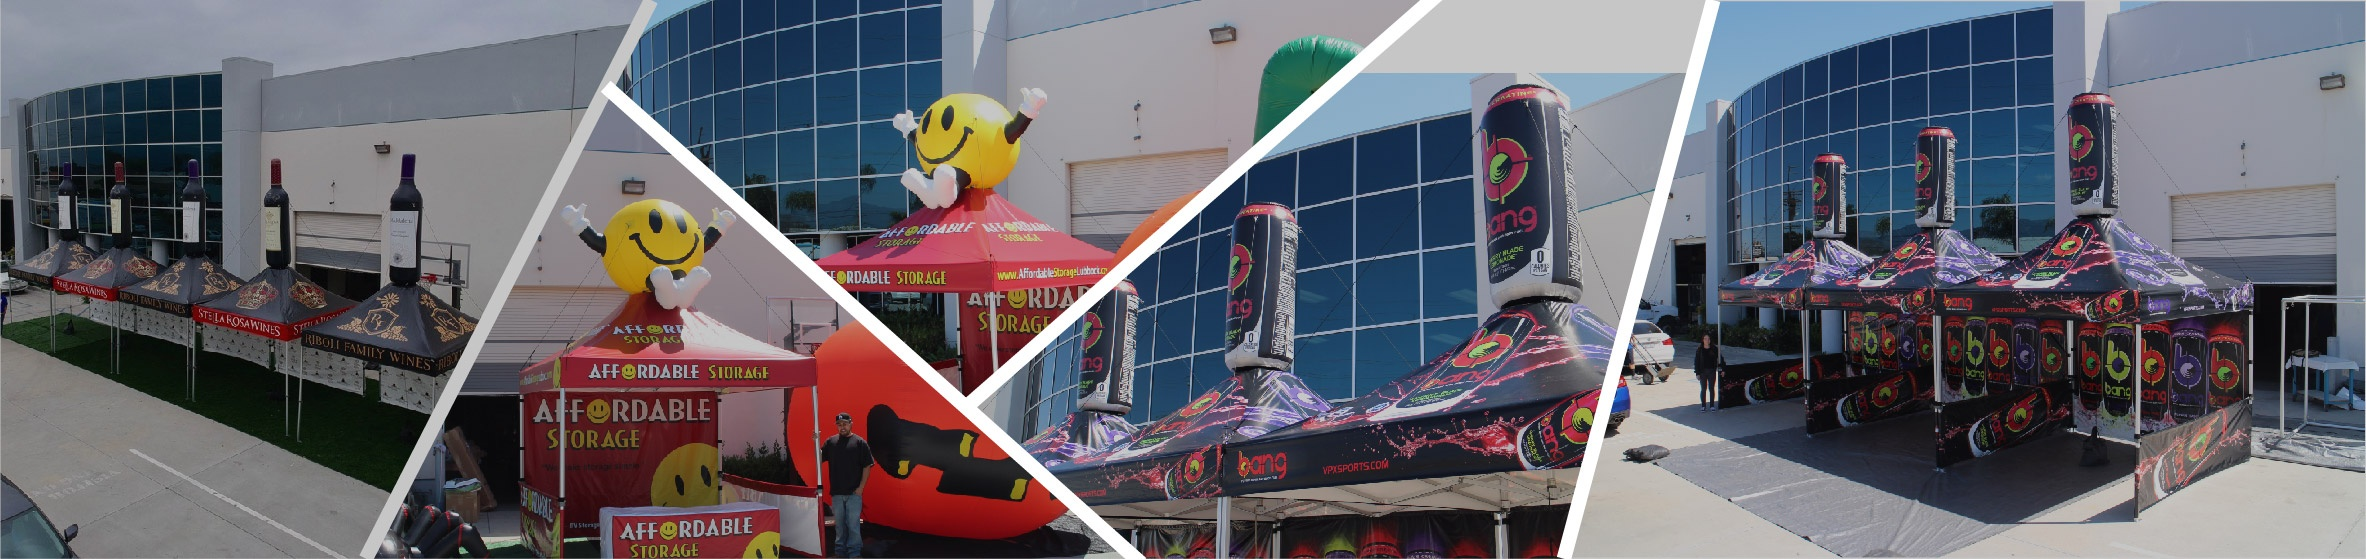 Pop Up Inflatable Header-01.jpg